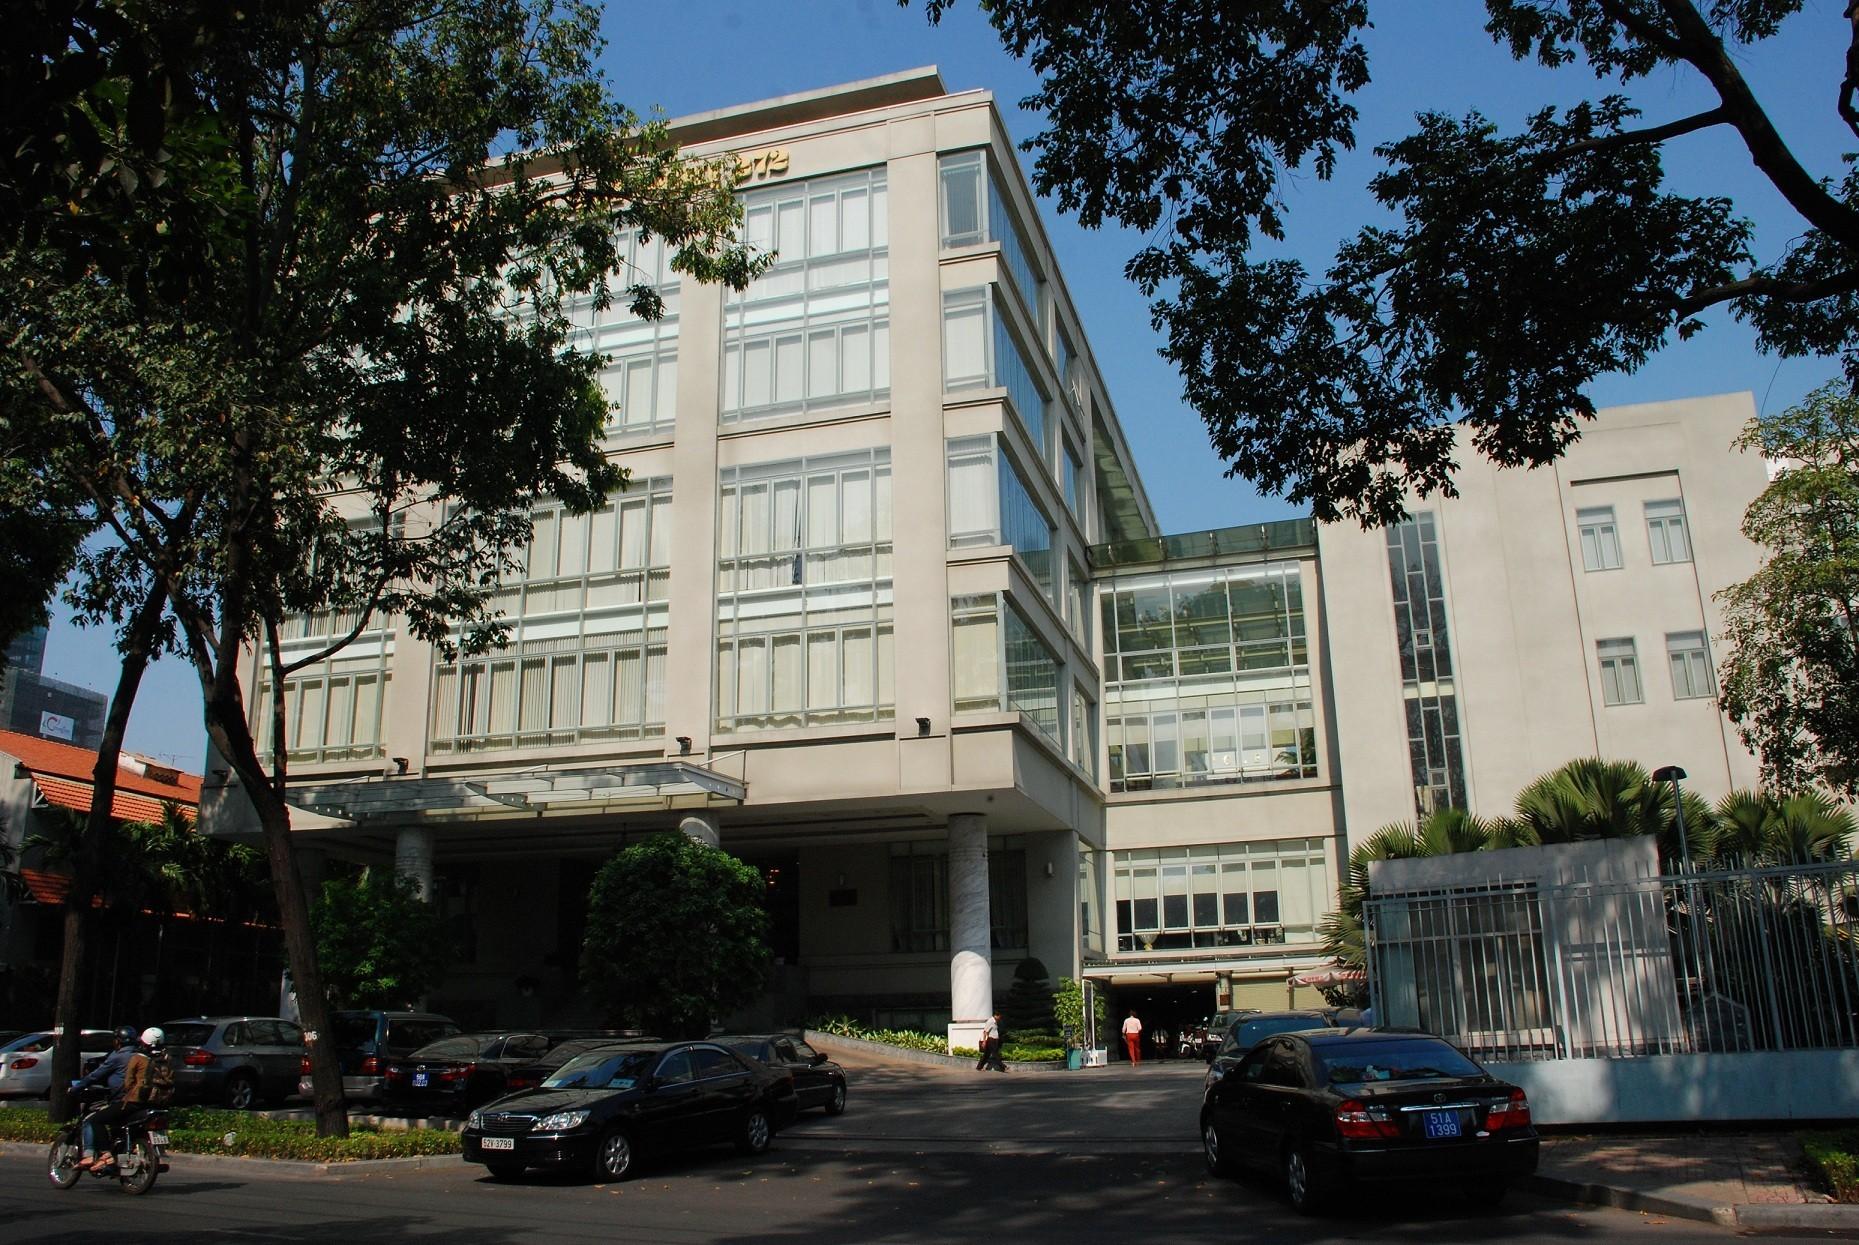 Hội trường Tp. Hồ Chí Minh